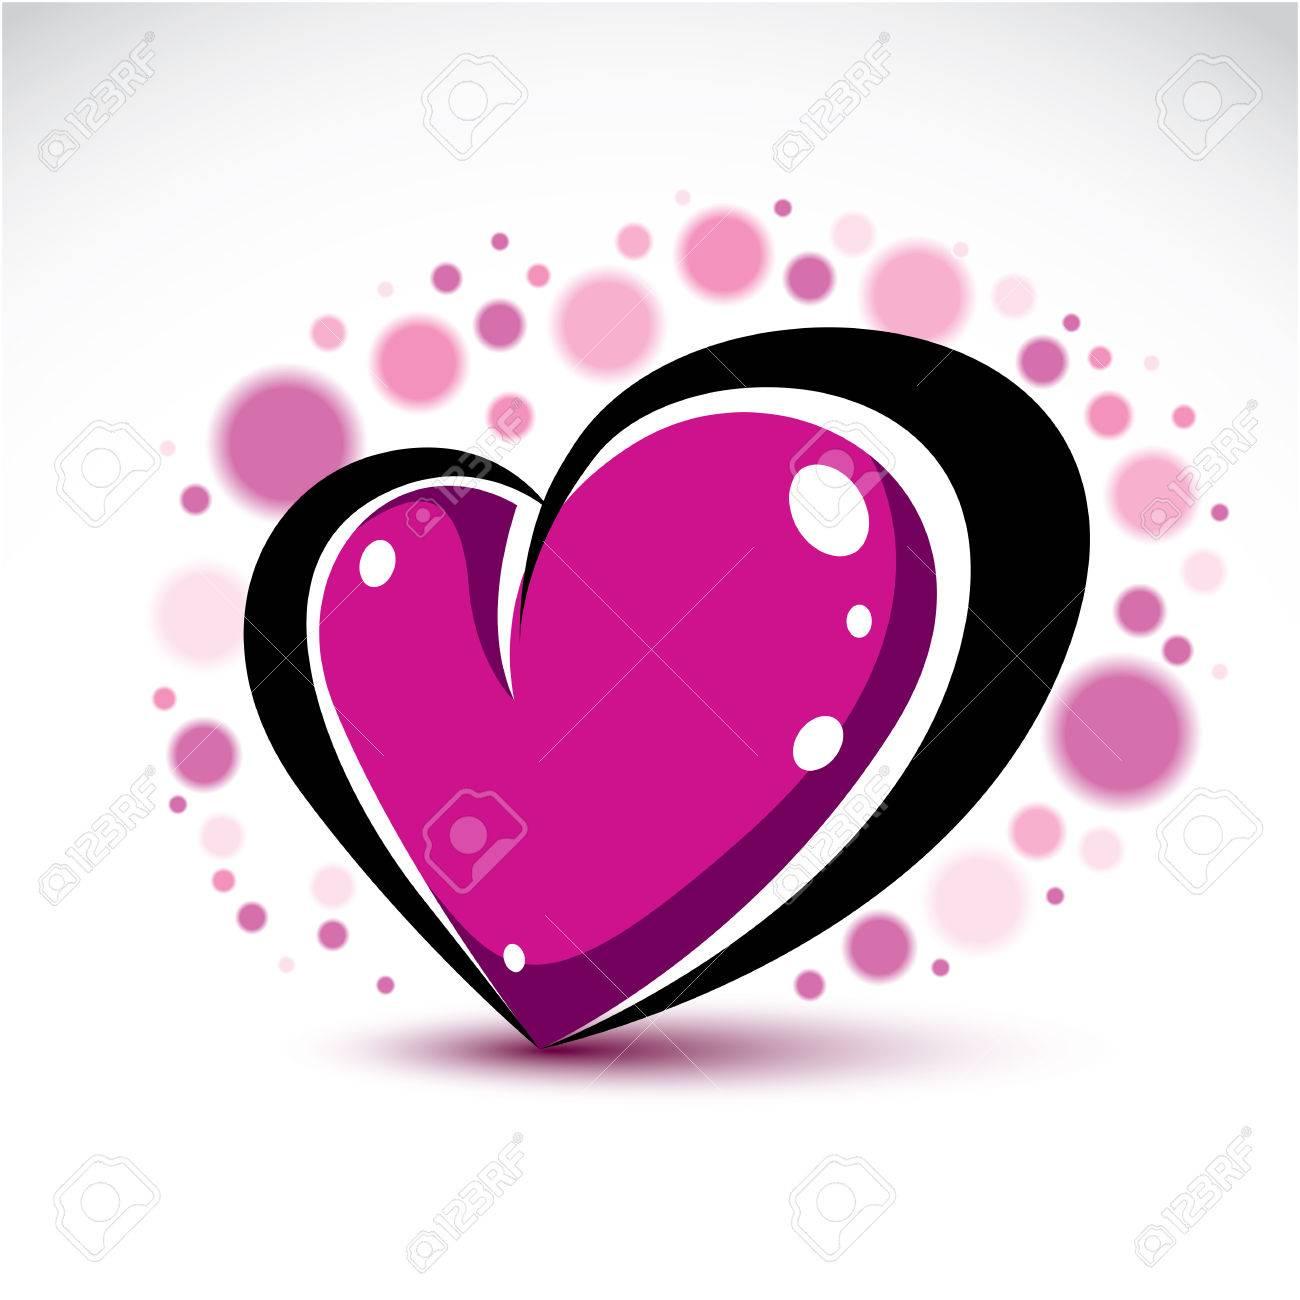 Love and romance symbolic object dimensional purple heart love and romance symbolic object dimensional purple heart decorated with transparent bubbles vector symbol buycottarizona